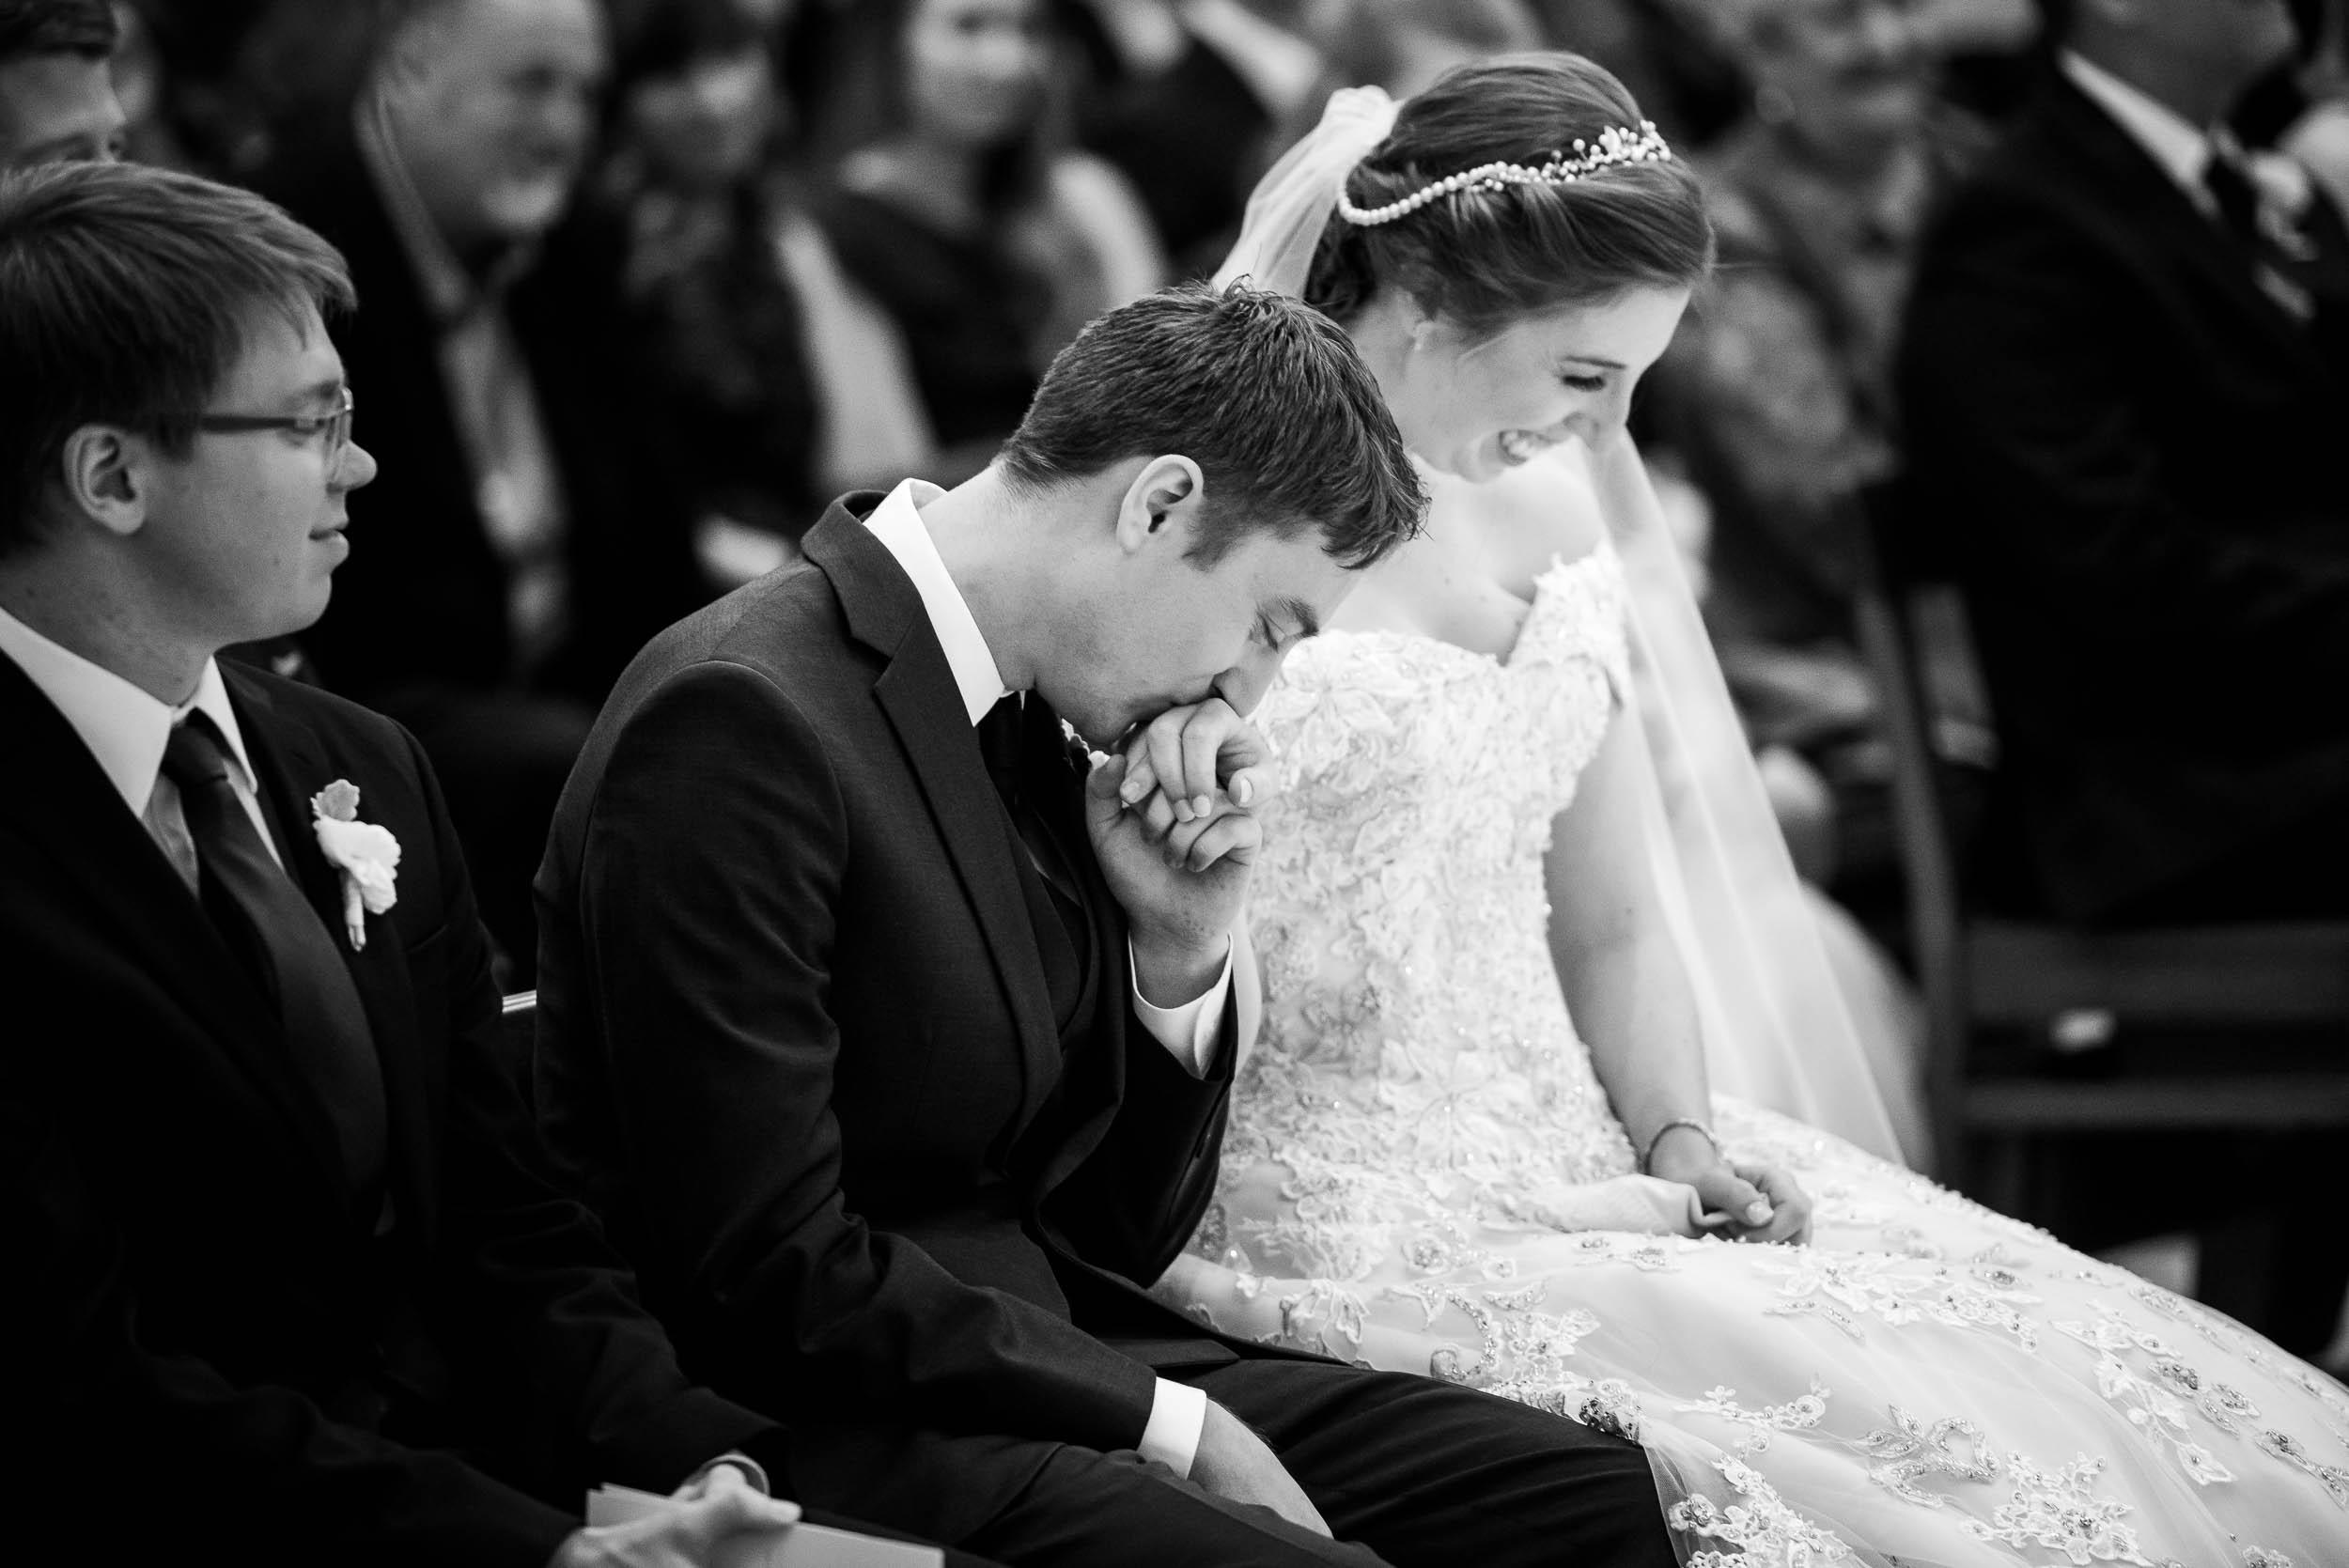 Groom kisses his brides hand during a wedding ceremony at Madonna Della Strada.